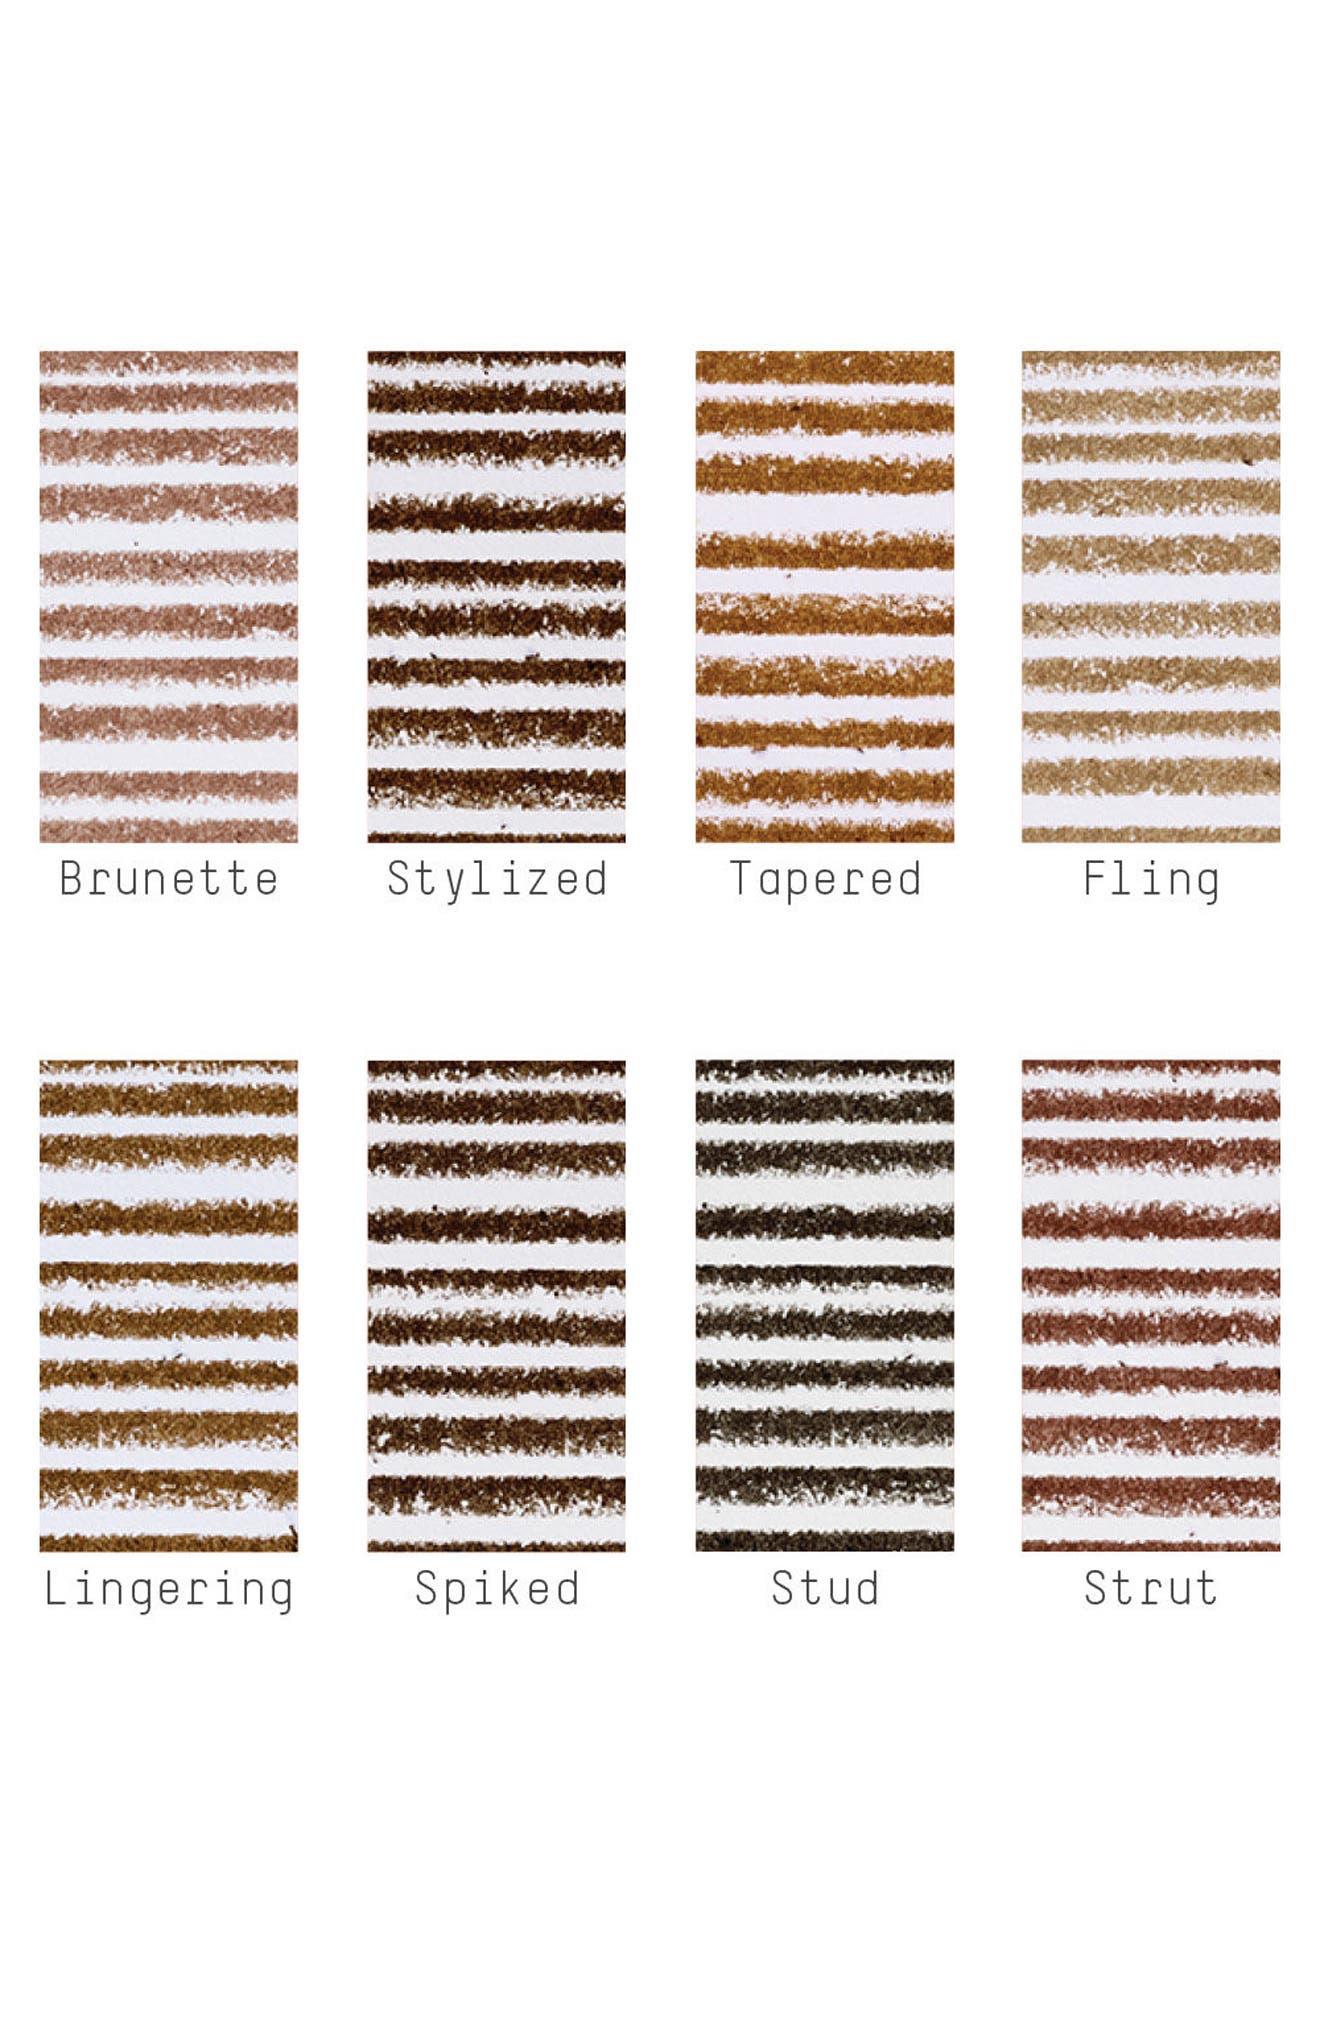 MAC COSMETICS, MAC Eyebrow Styler, Alternate thumbnail 7, color, FLING